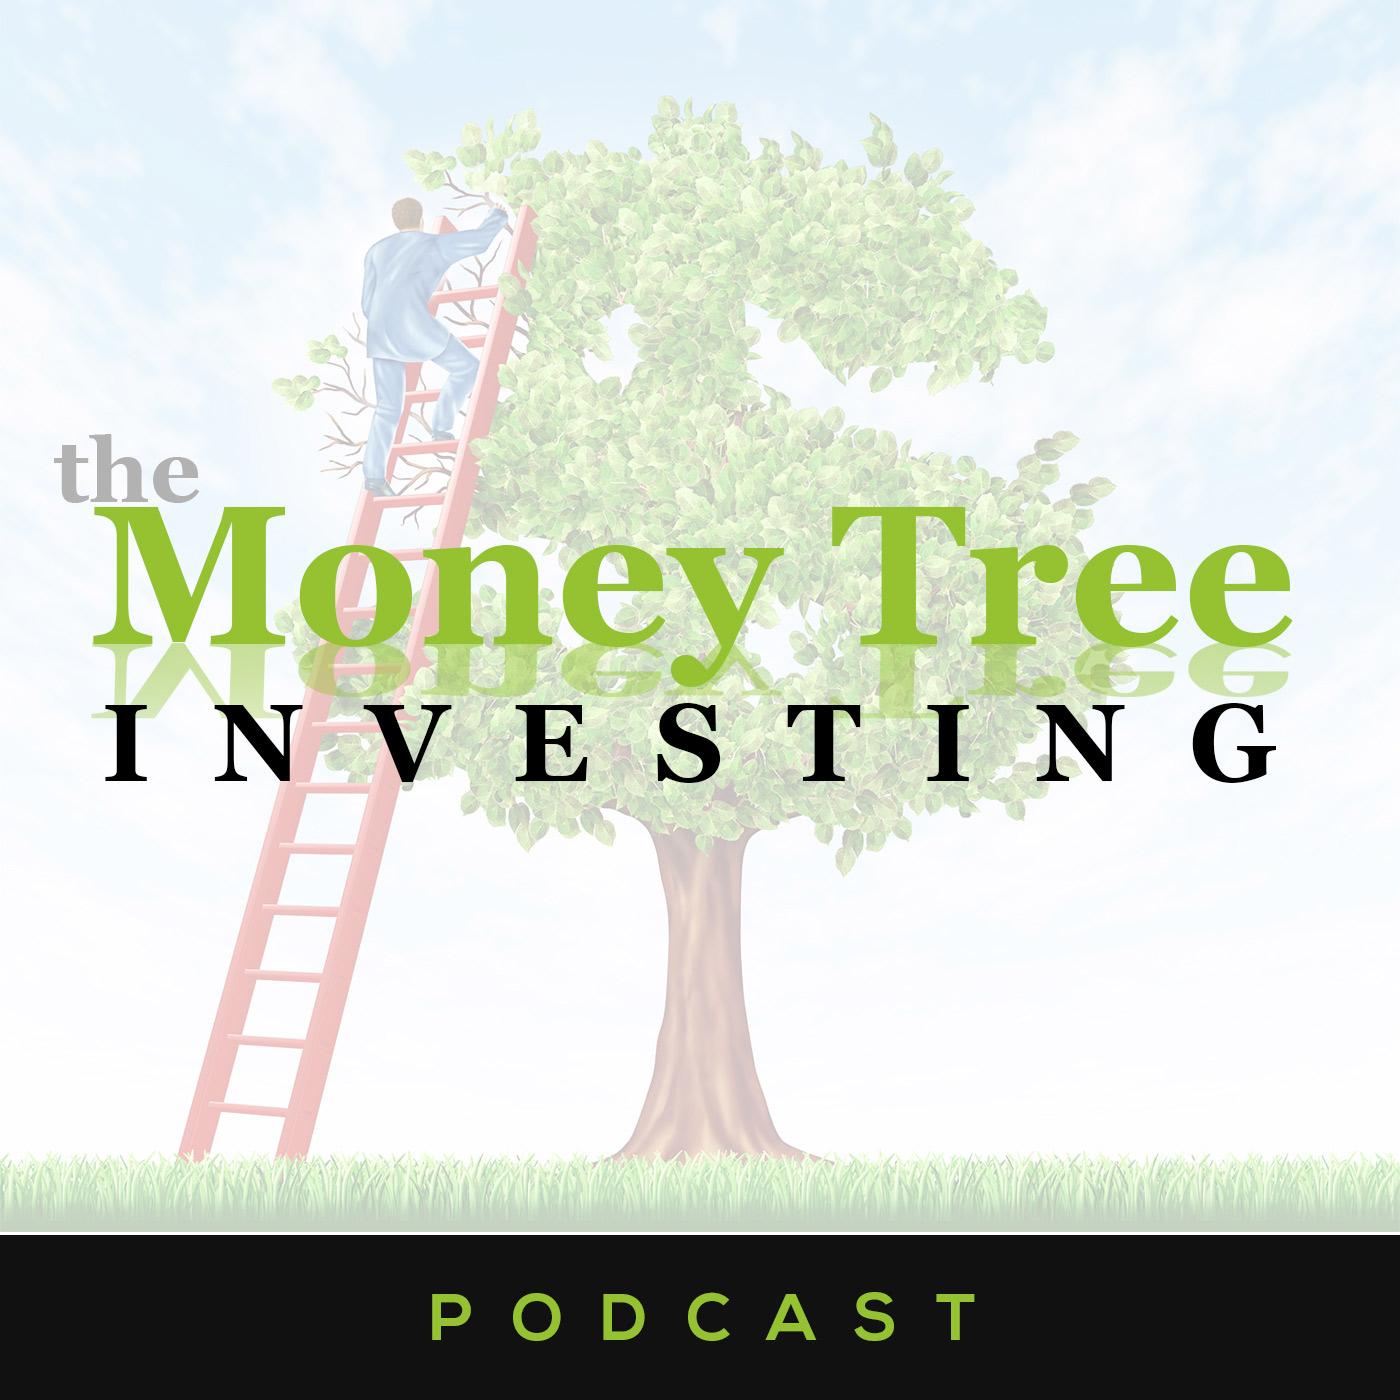 Money Tree Investing Podcast | Stock Market | Wealth | Personal Finance | Value Stocks